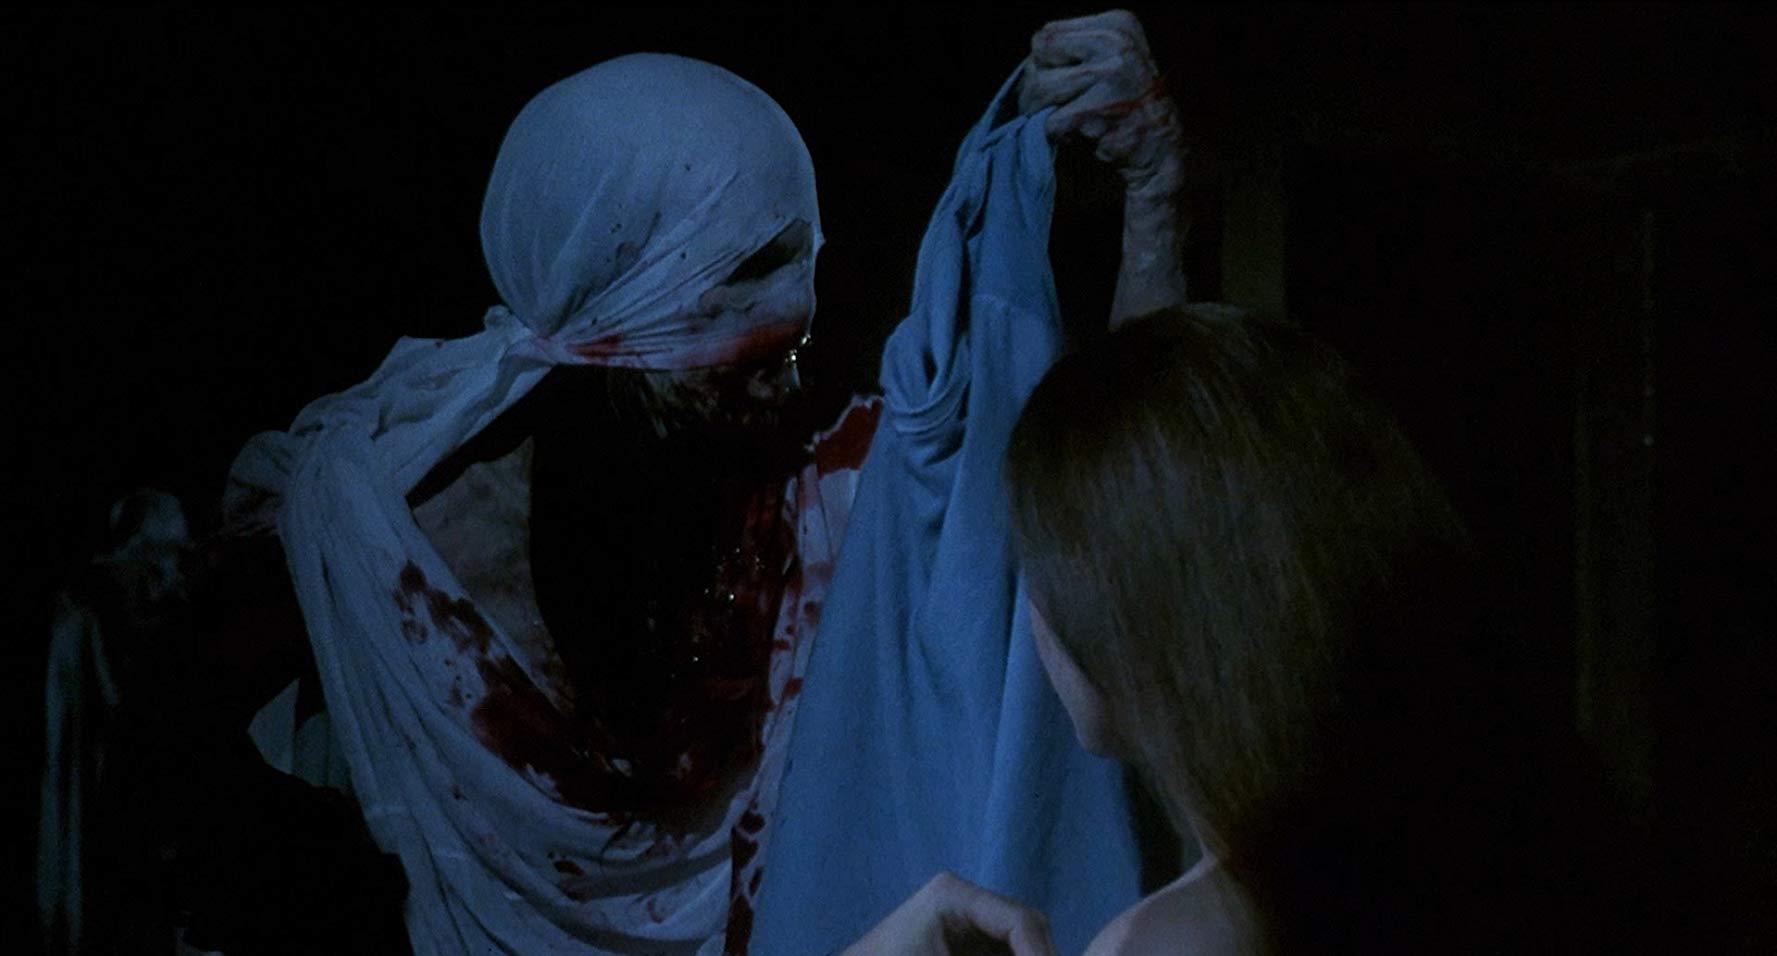 Jessica Dollarhide encounters the creature in Castle Freak (1995)